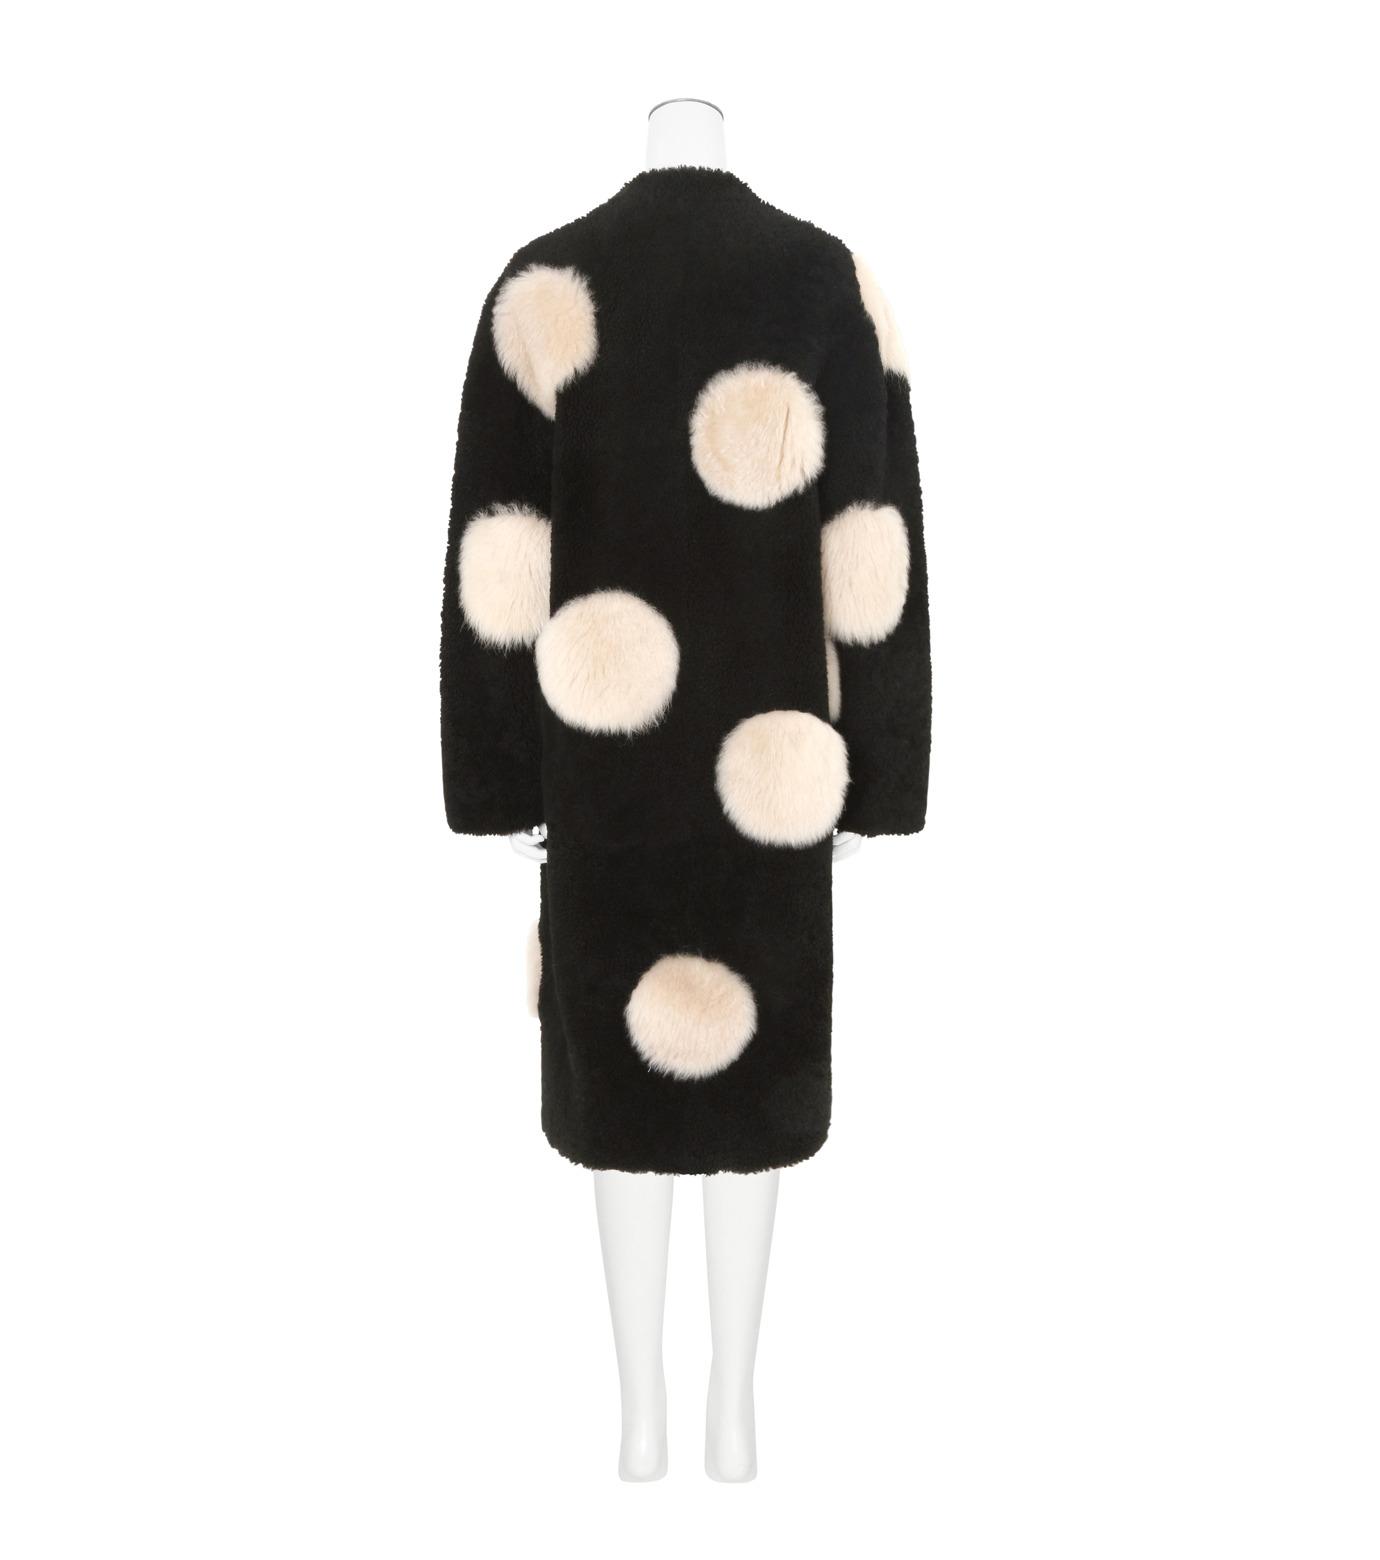 ANNE VEST(アンベスト)のLayla Coat w/Dots Reversible-BLACK-AW160121028-13 拡大詳細画像2